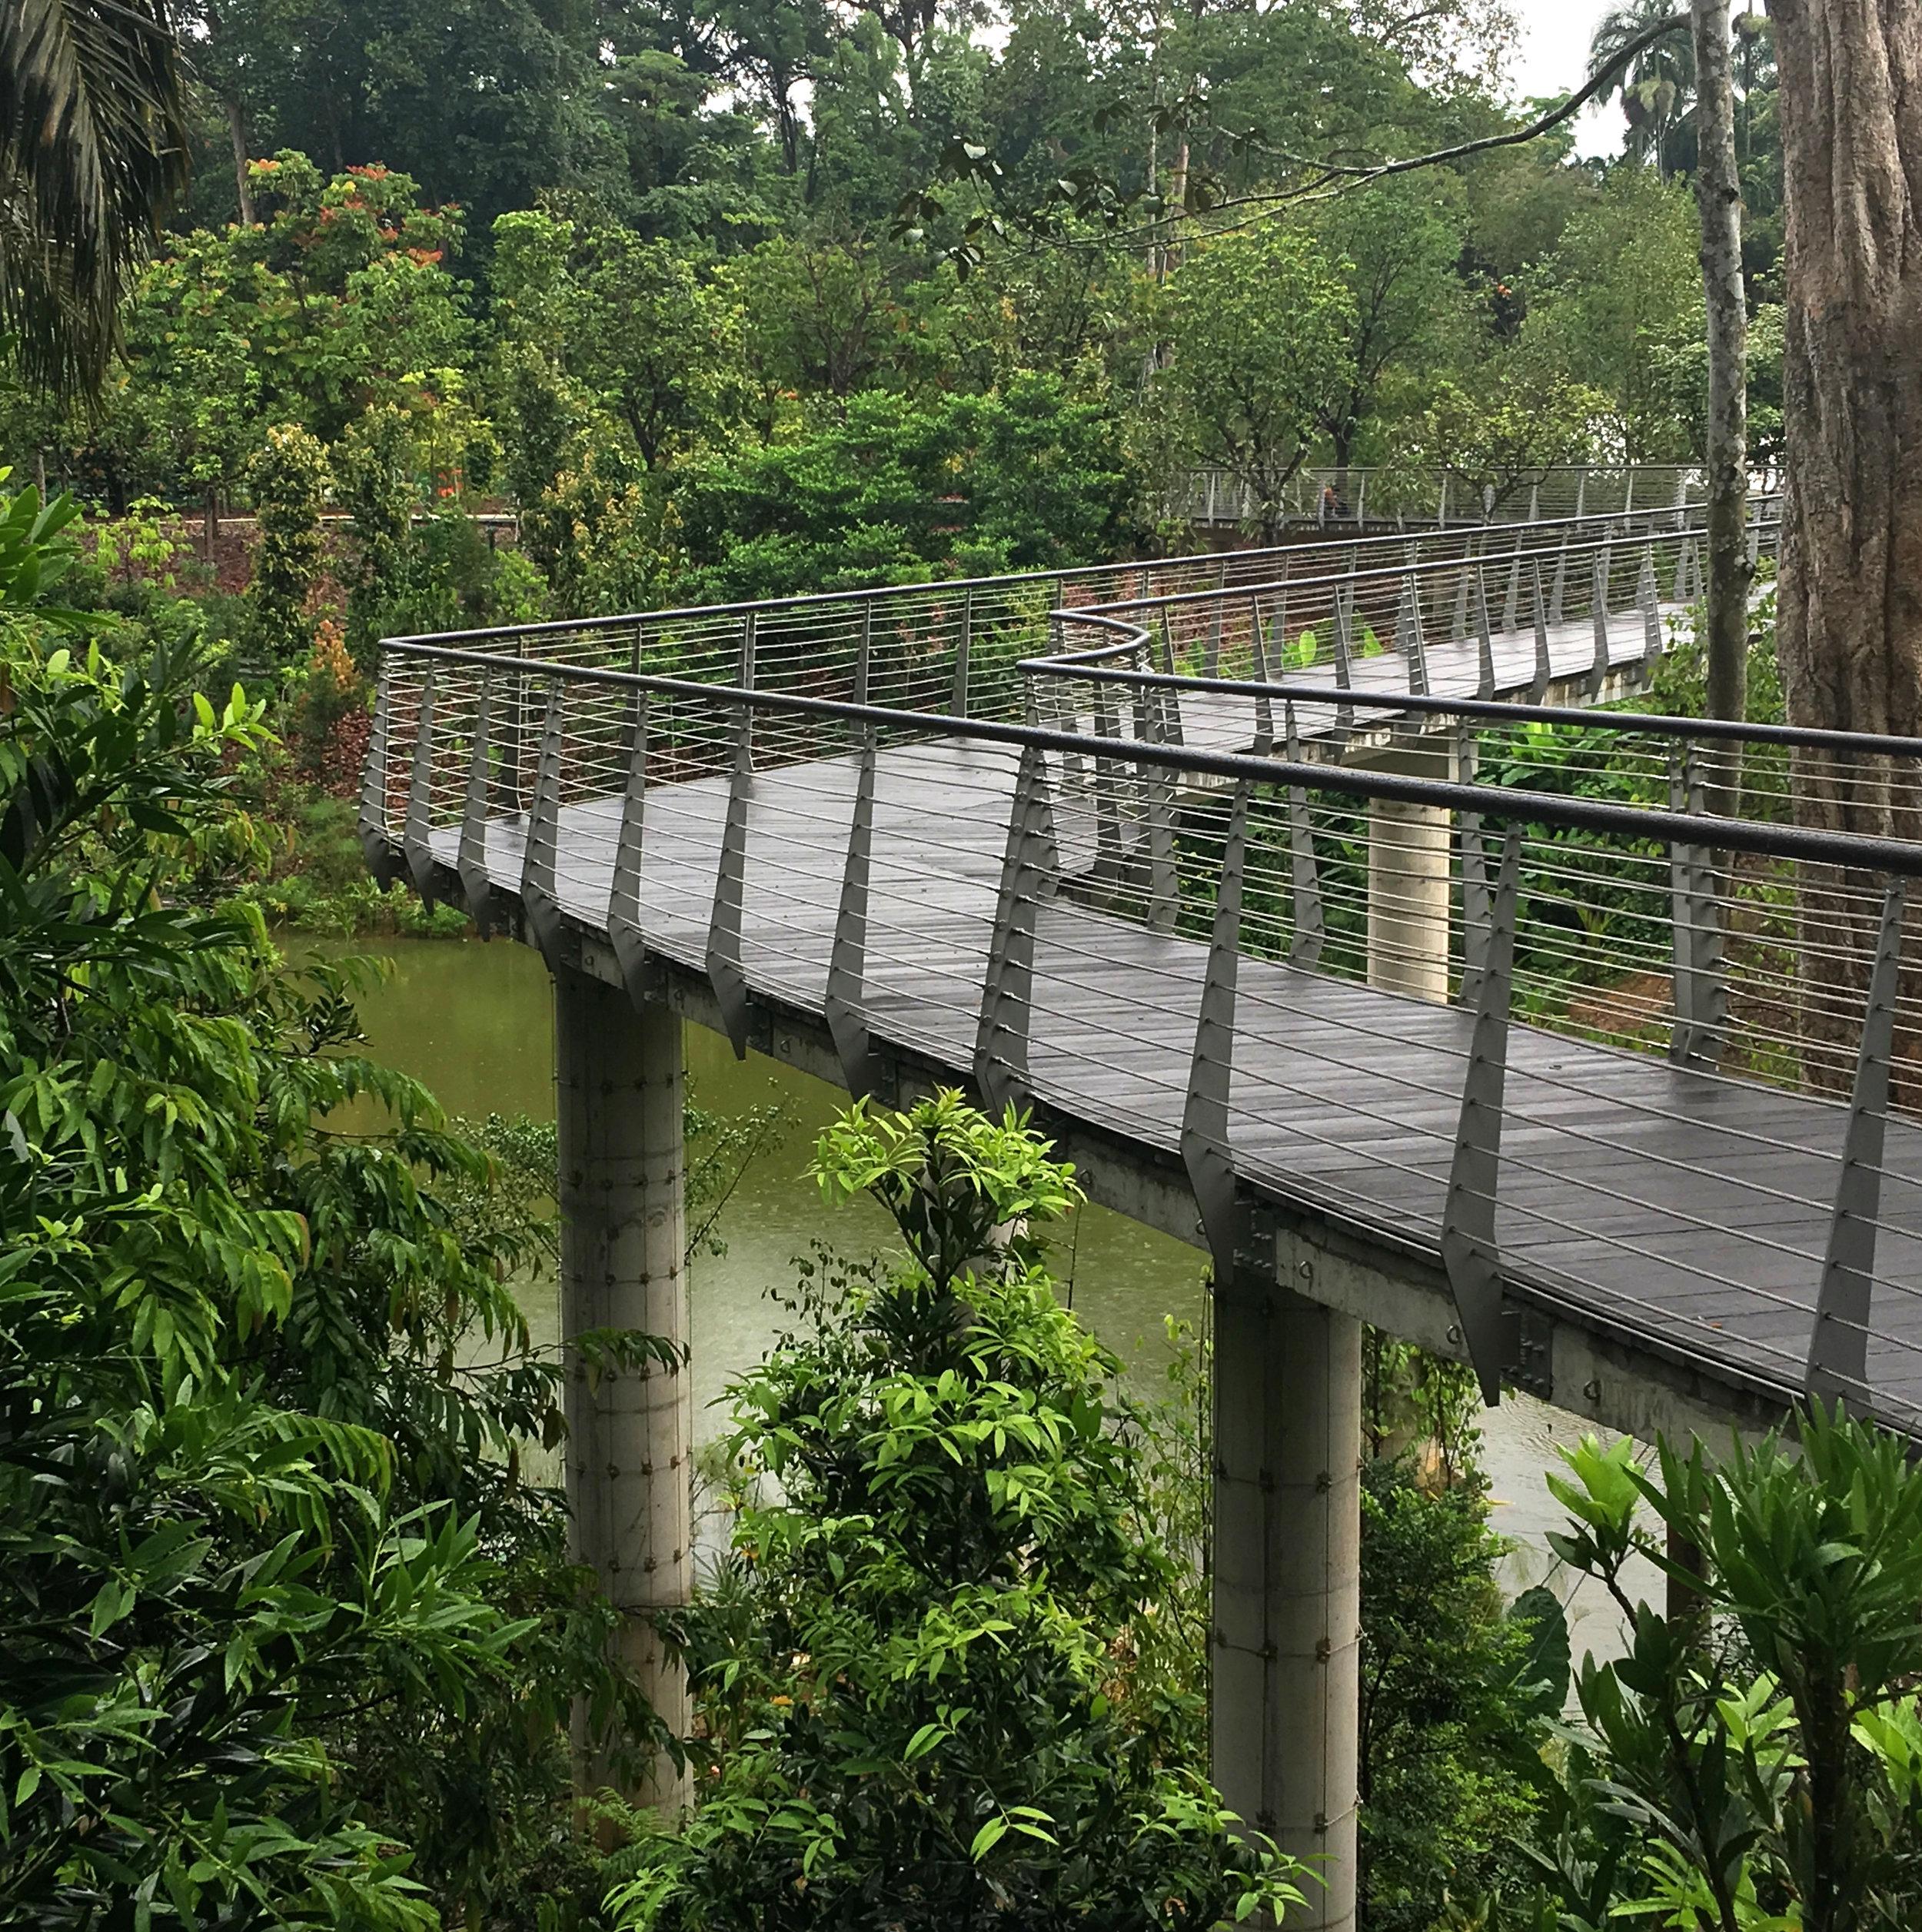 HIgh level walkway over wetlands